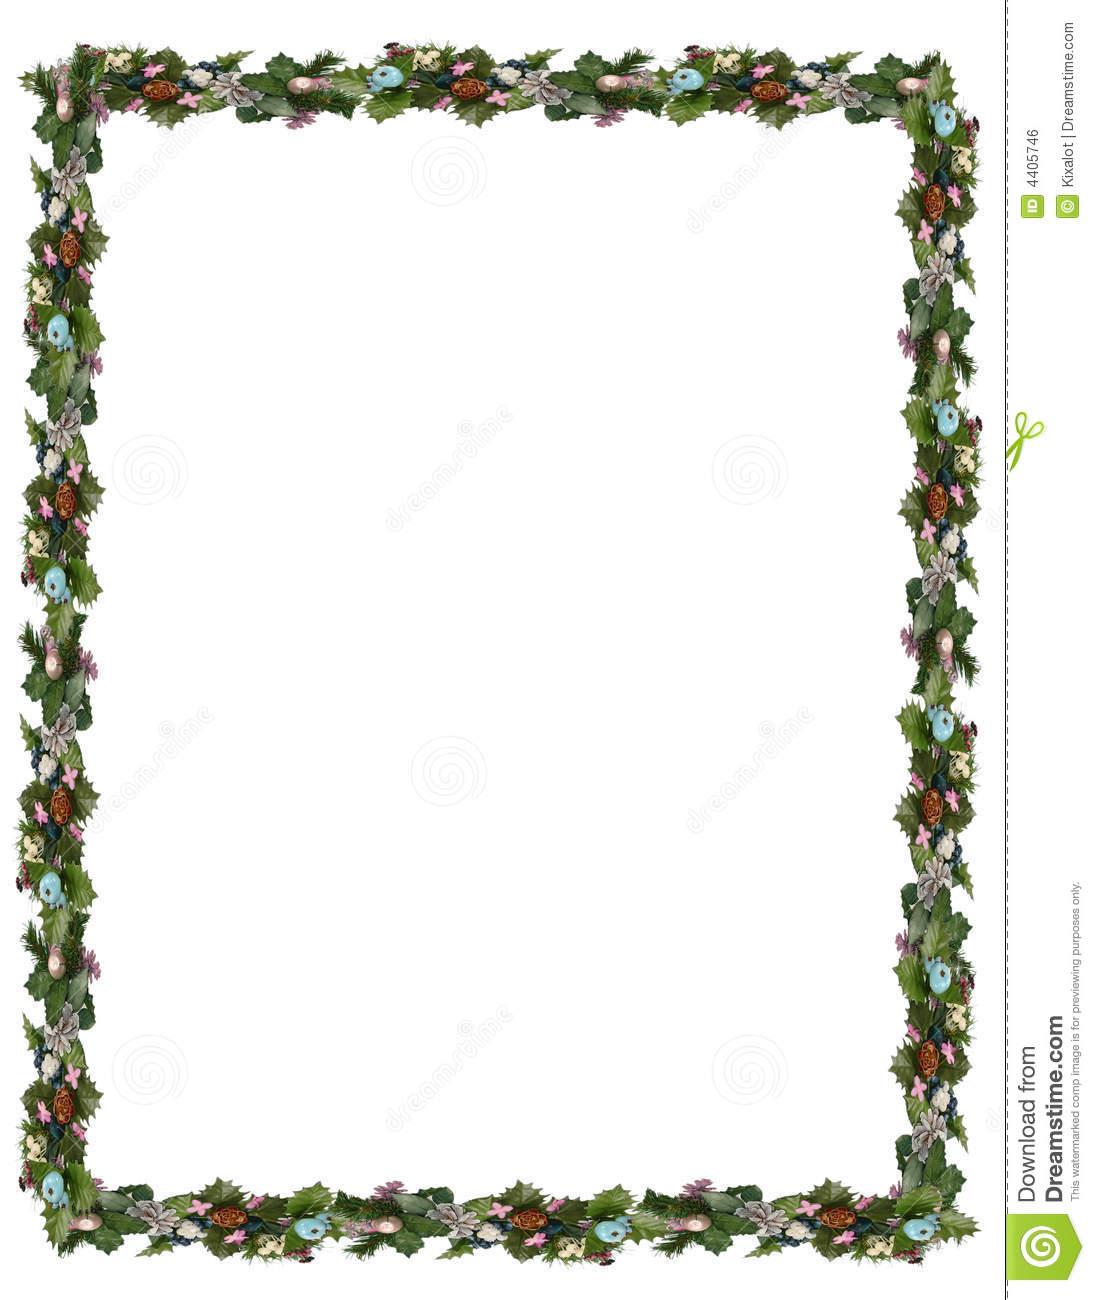 Calendar Clip Art Border : Clipart christmas light border new calendar template site